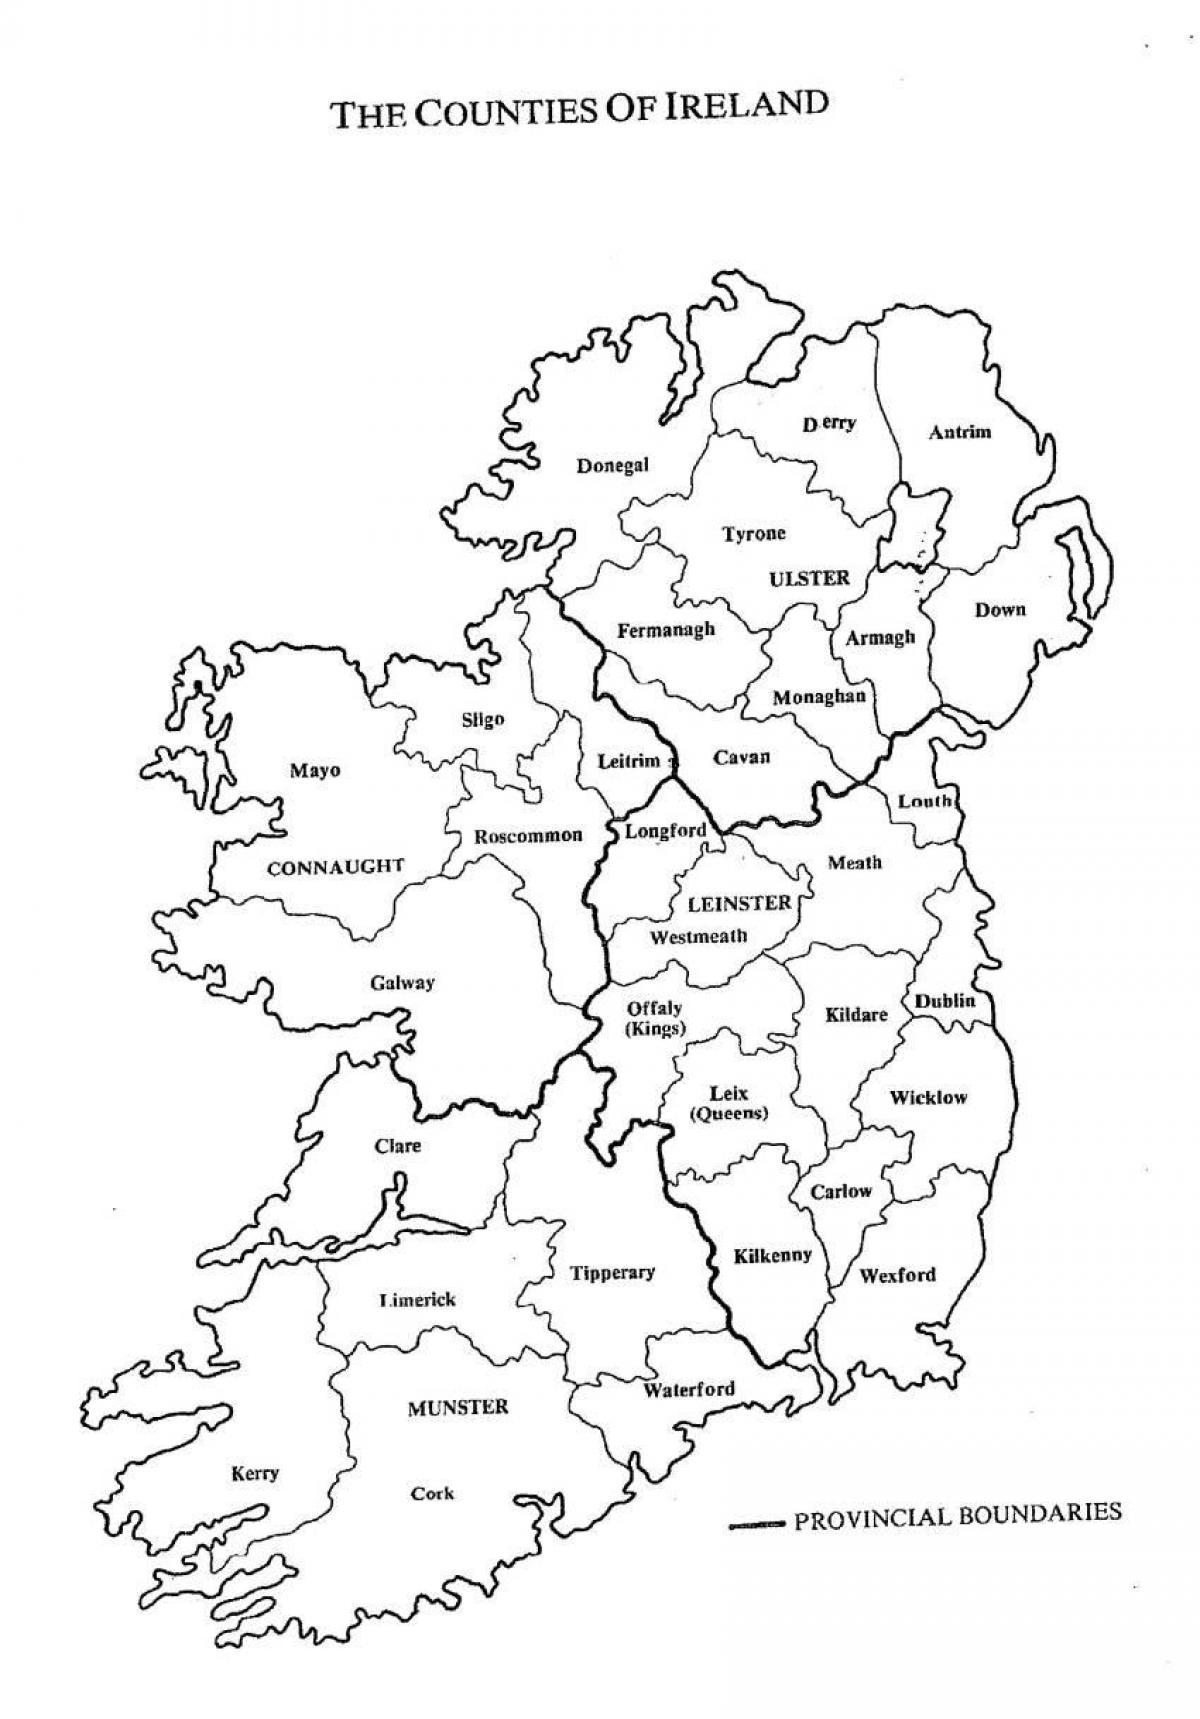 Slepa Mapa Irska S Kraje Skica Mapy Irska Severni Evropa Evropa